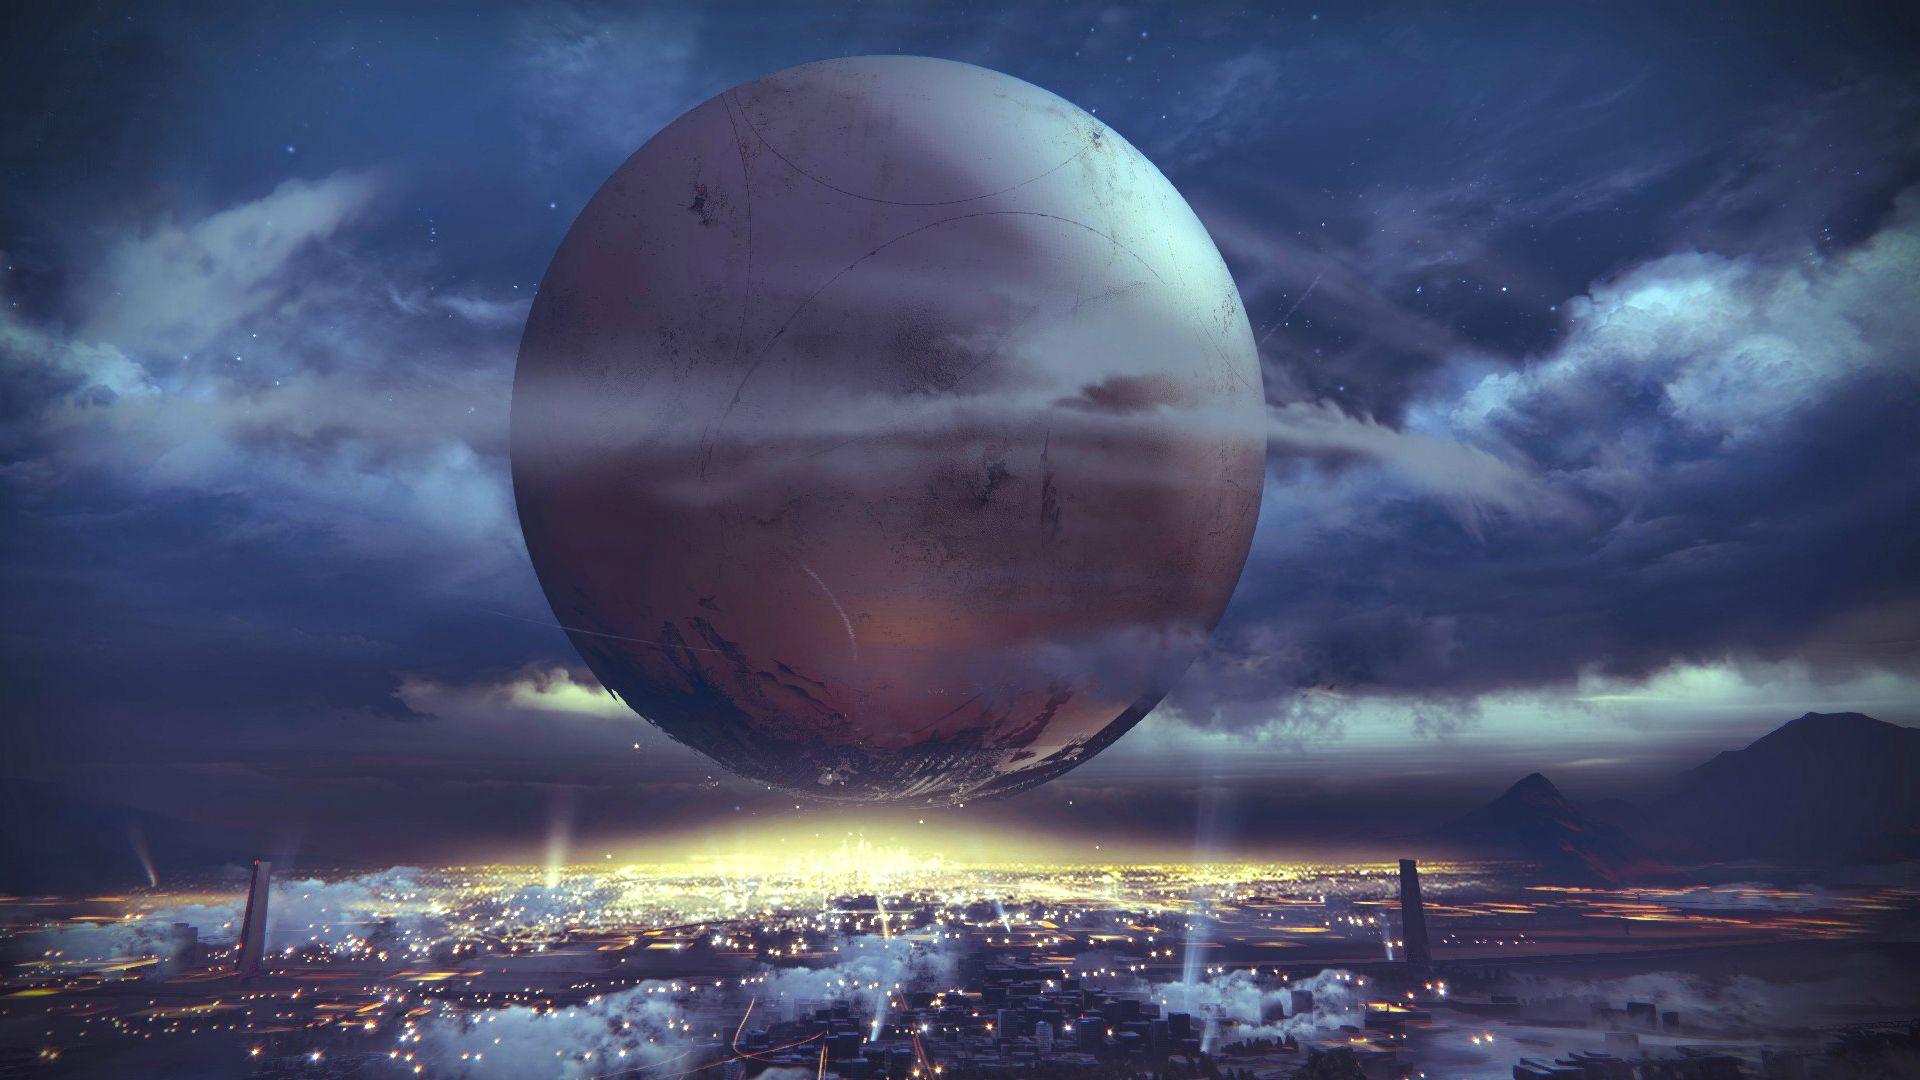 Destiny 2 The Traveler